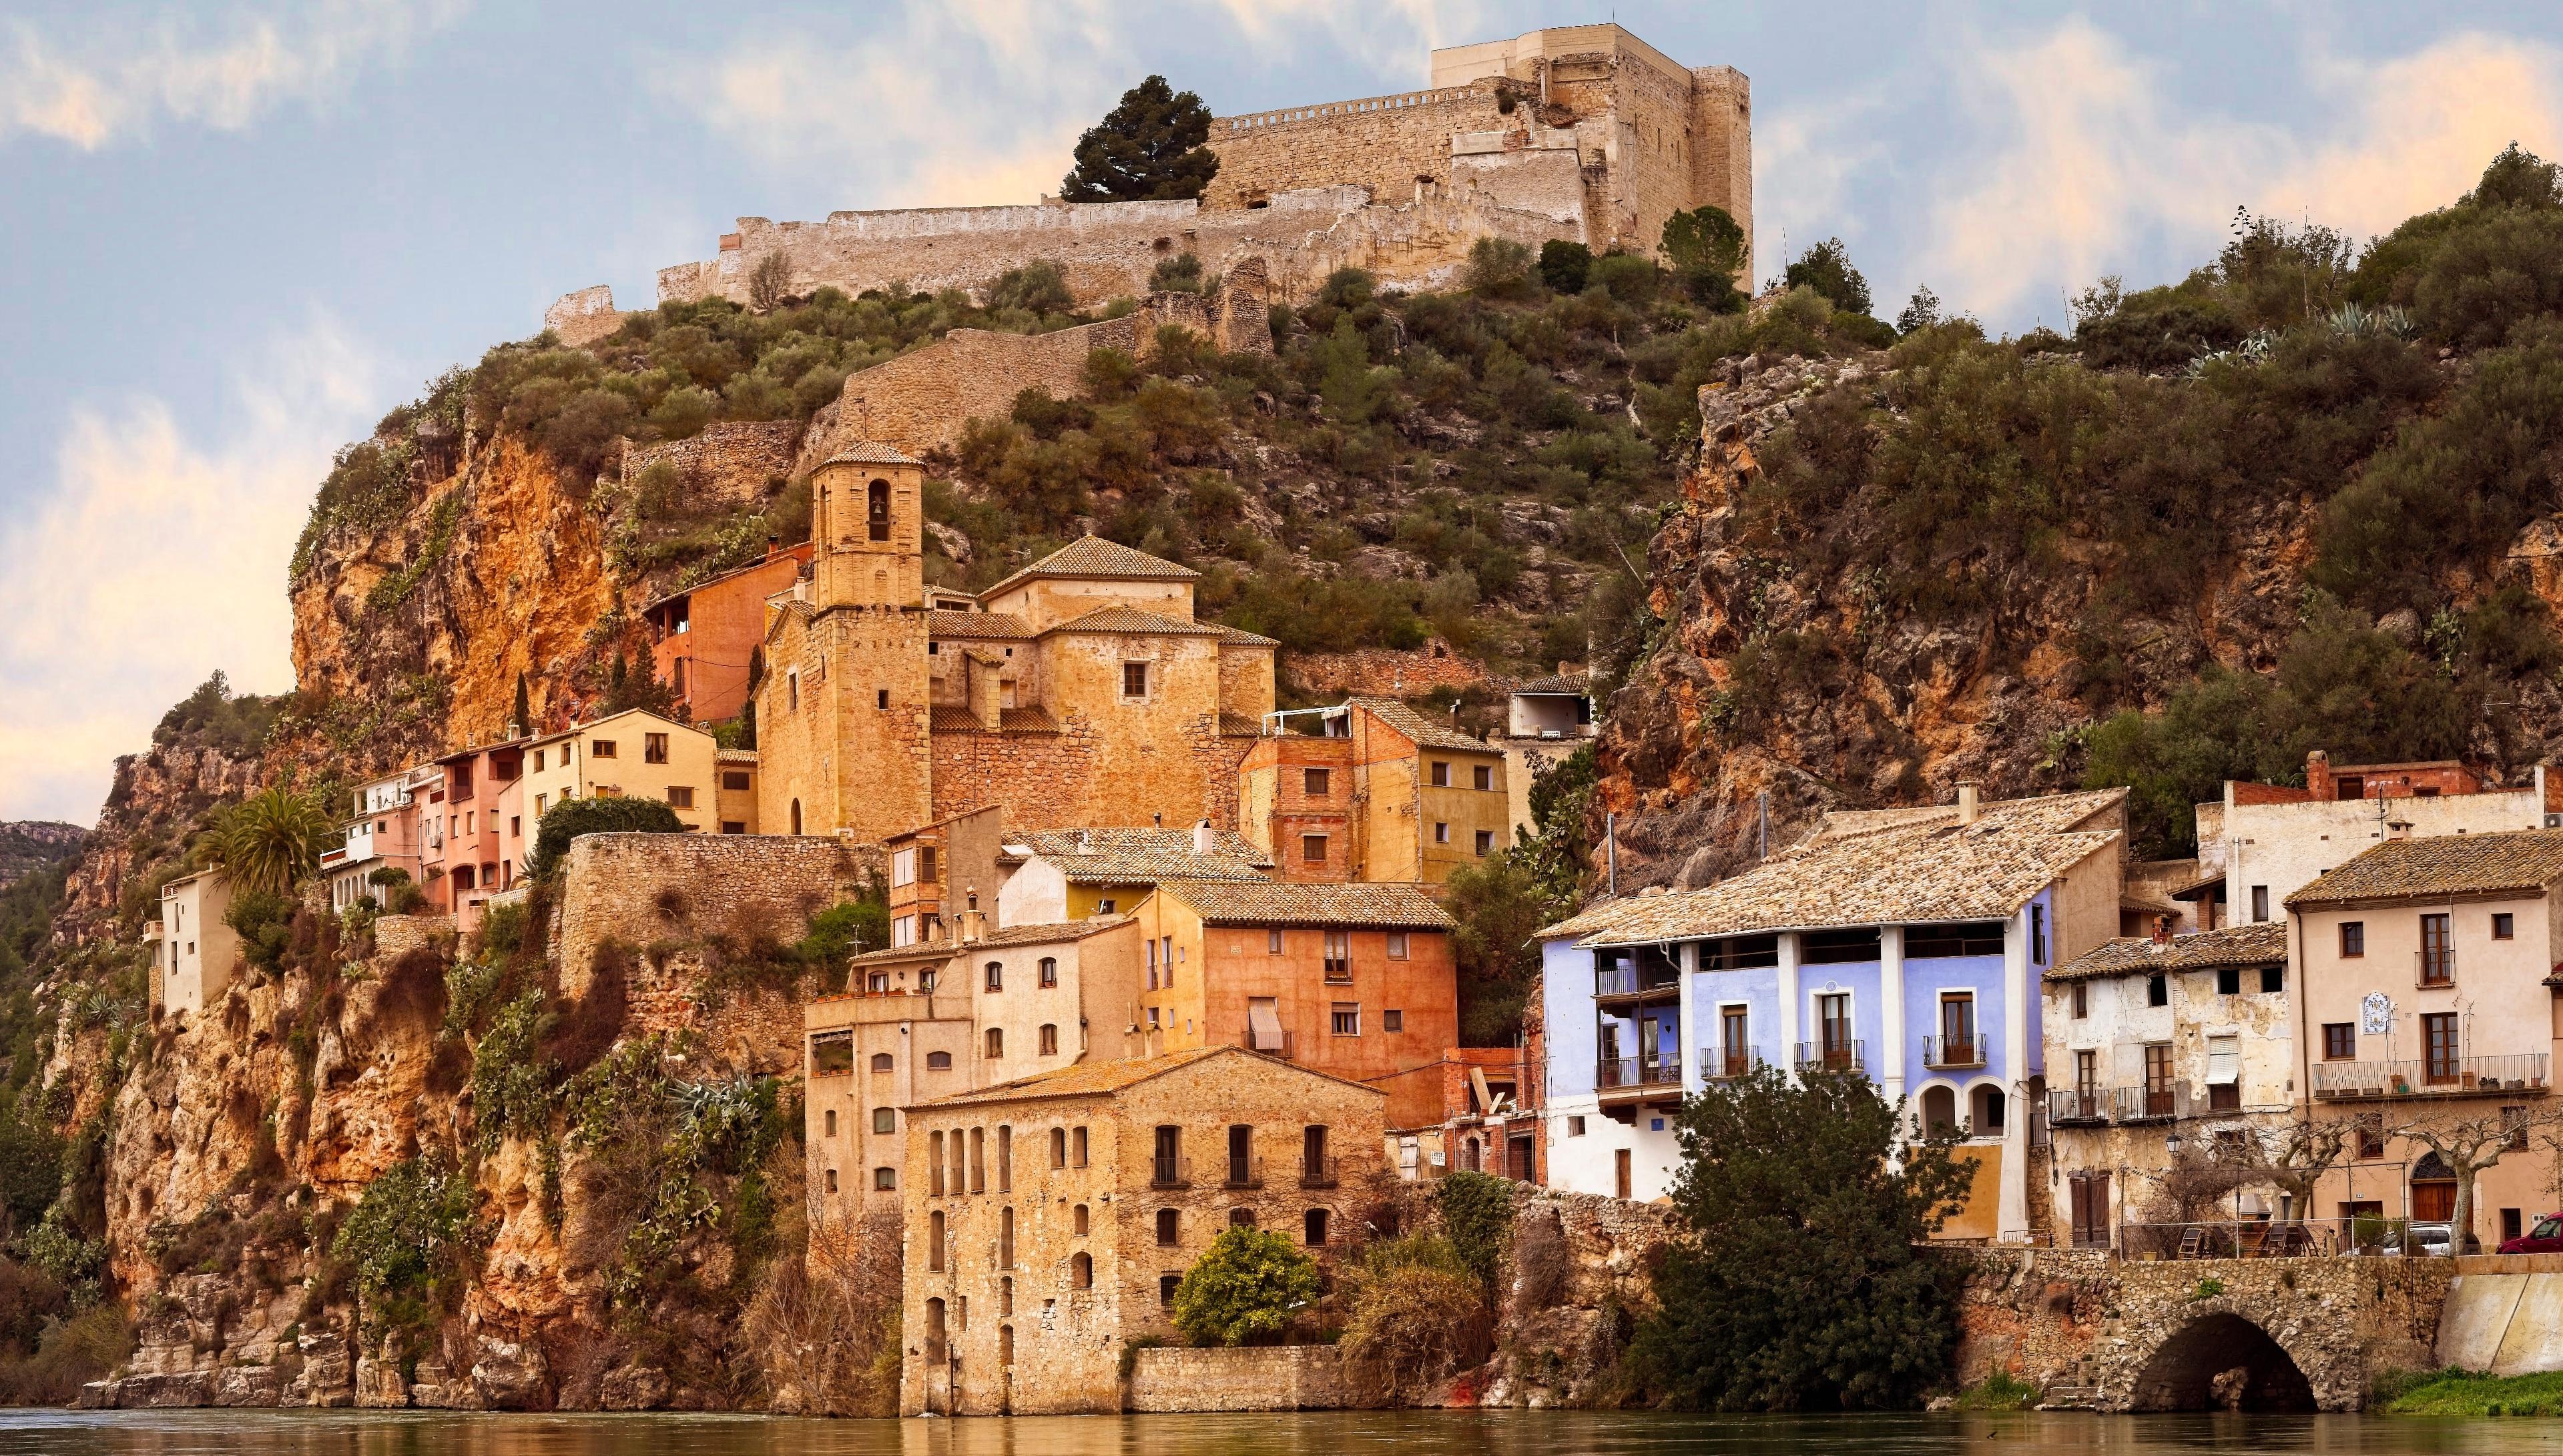 Miravet, Catalonia, Spain